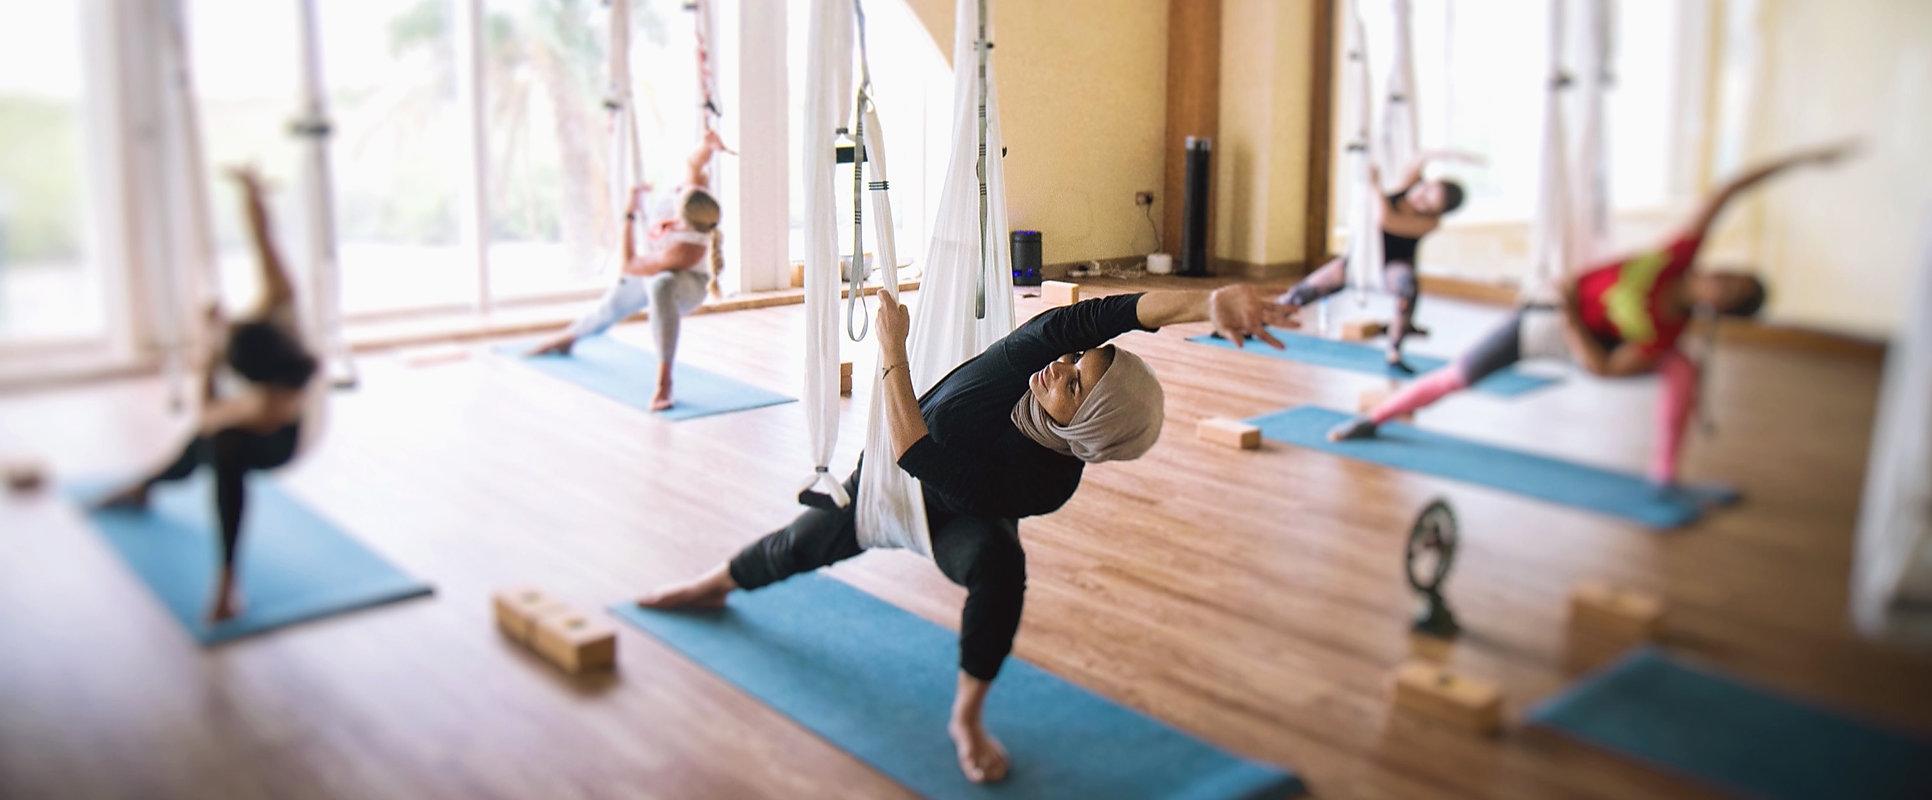 Seven Wellness Swing Yoga Class